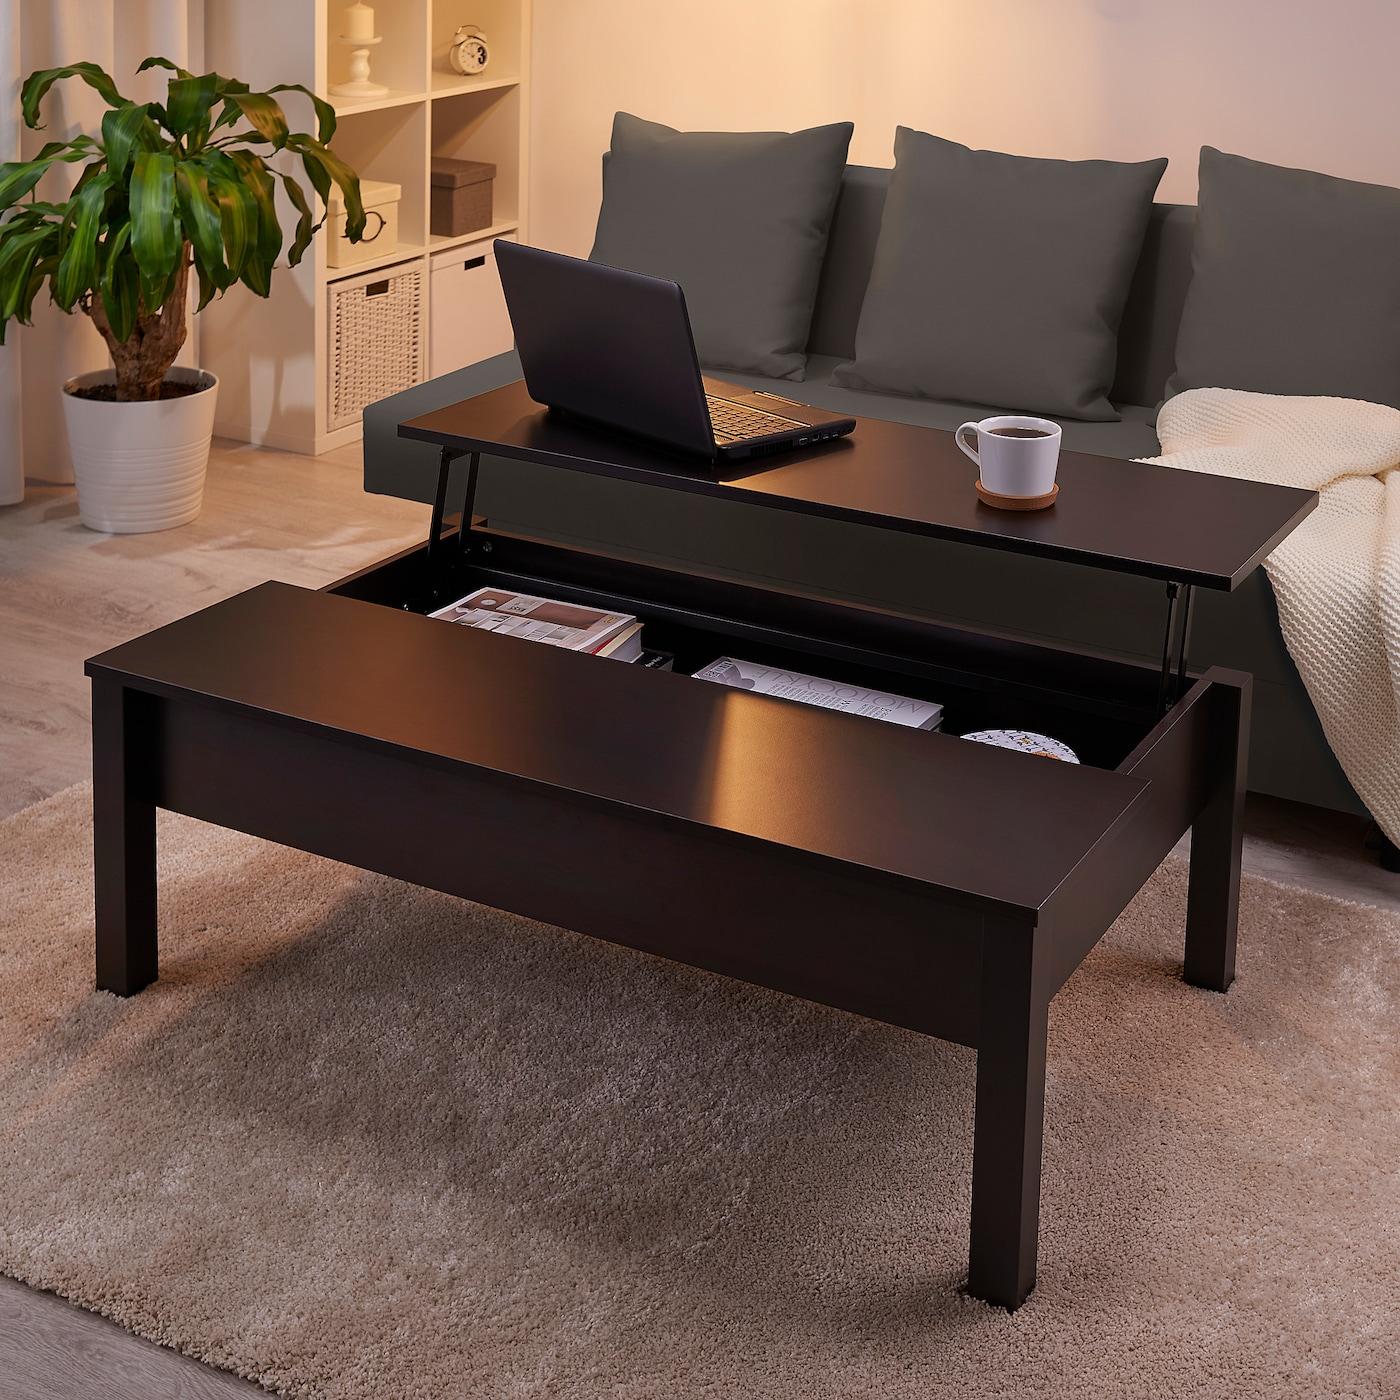 - TRULSTORP Coffee Table, Black-brown, 45 1/4x27 1/2